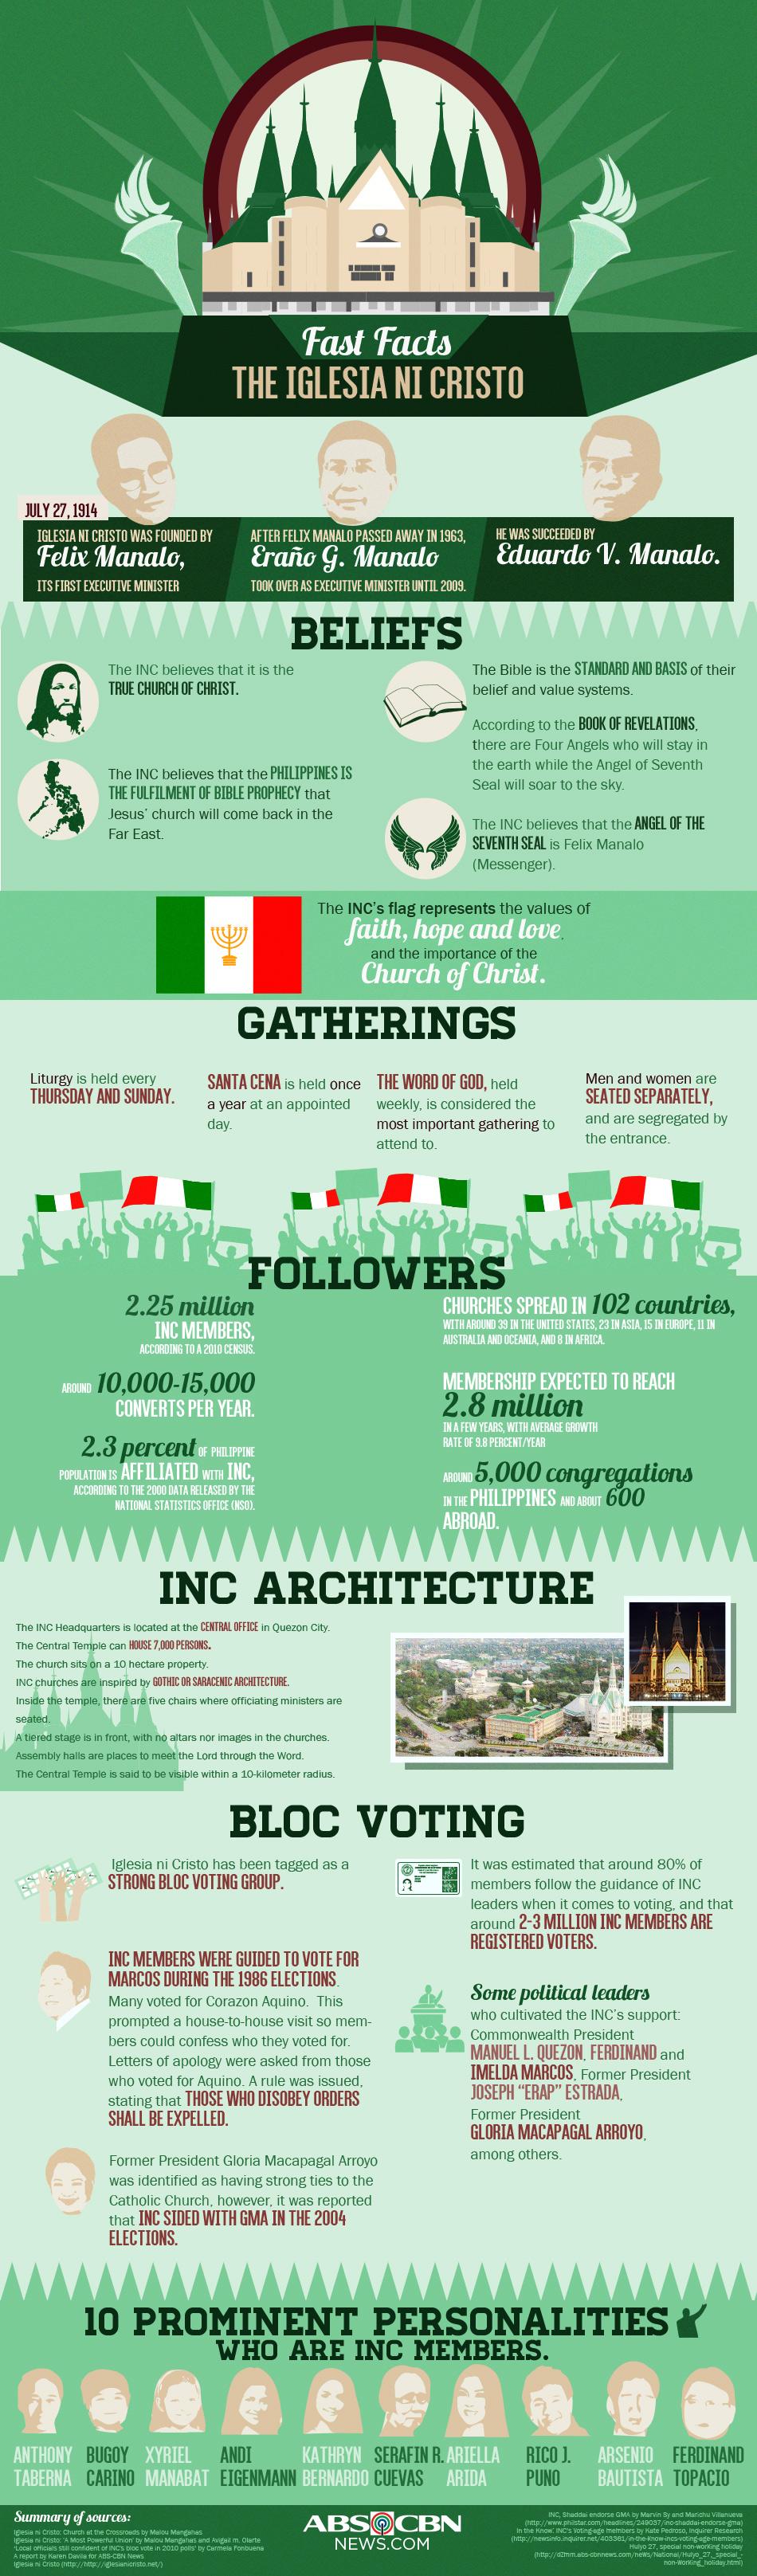 INFOGRAPHIC: Quick facts on Iglesia ni Cristo | The true church My